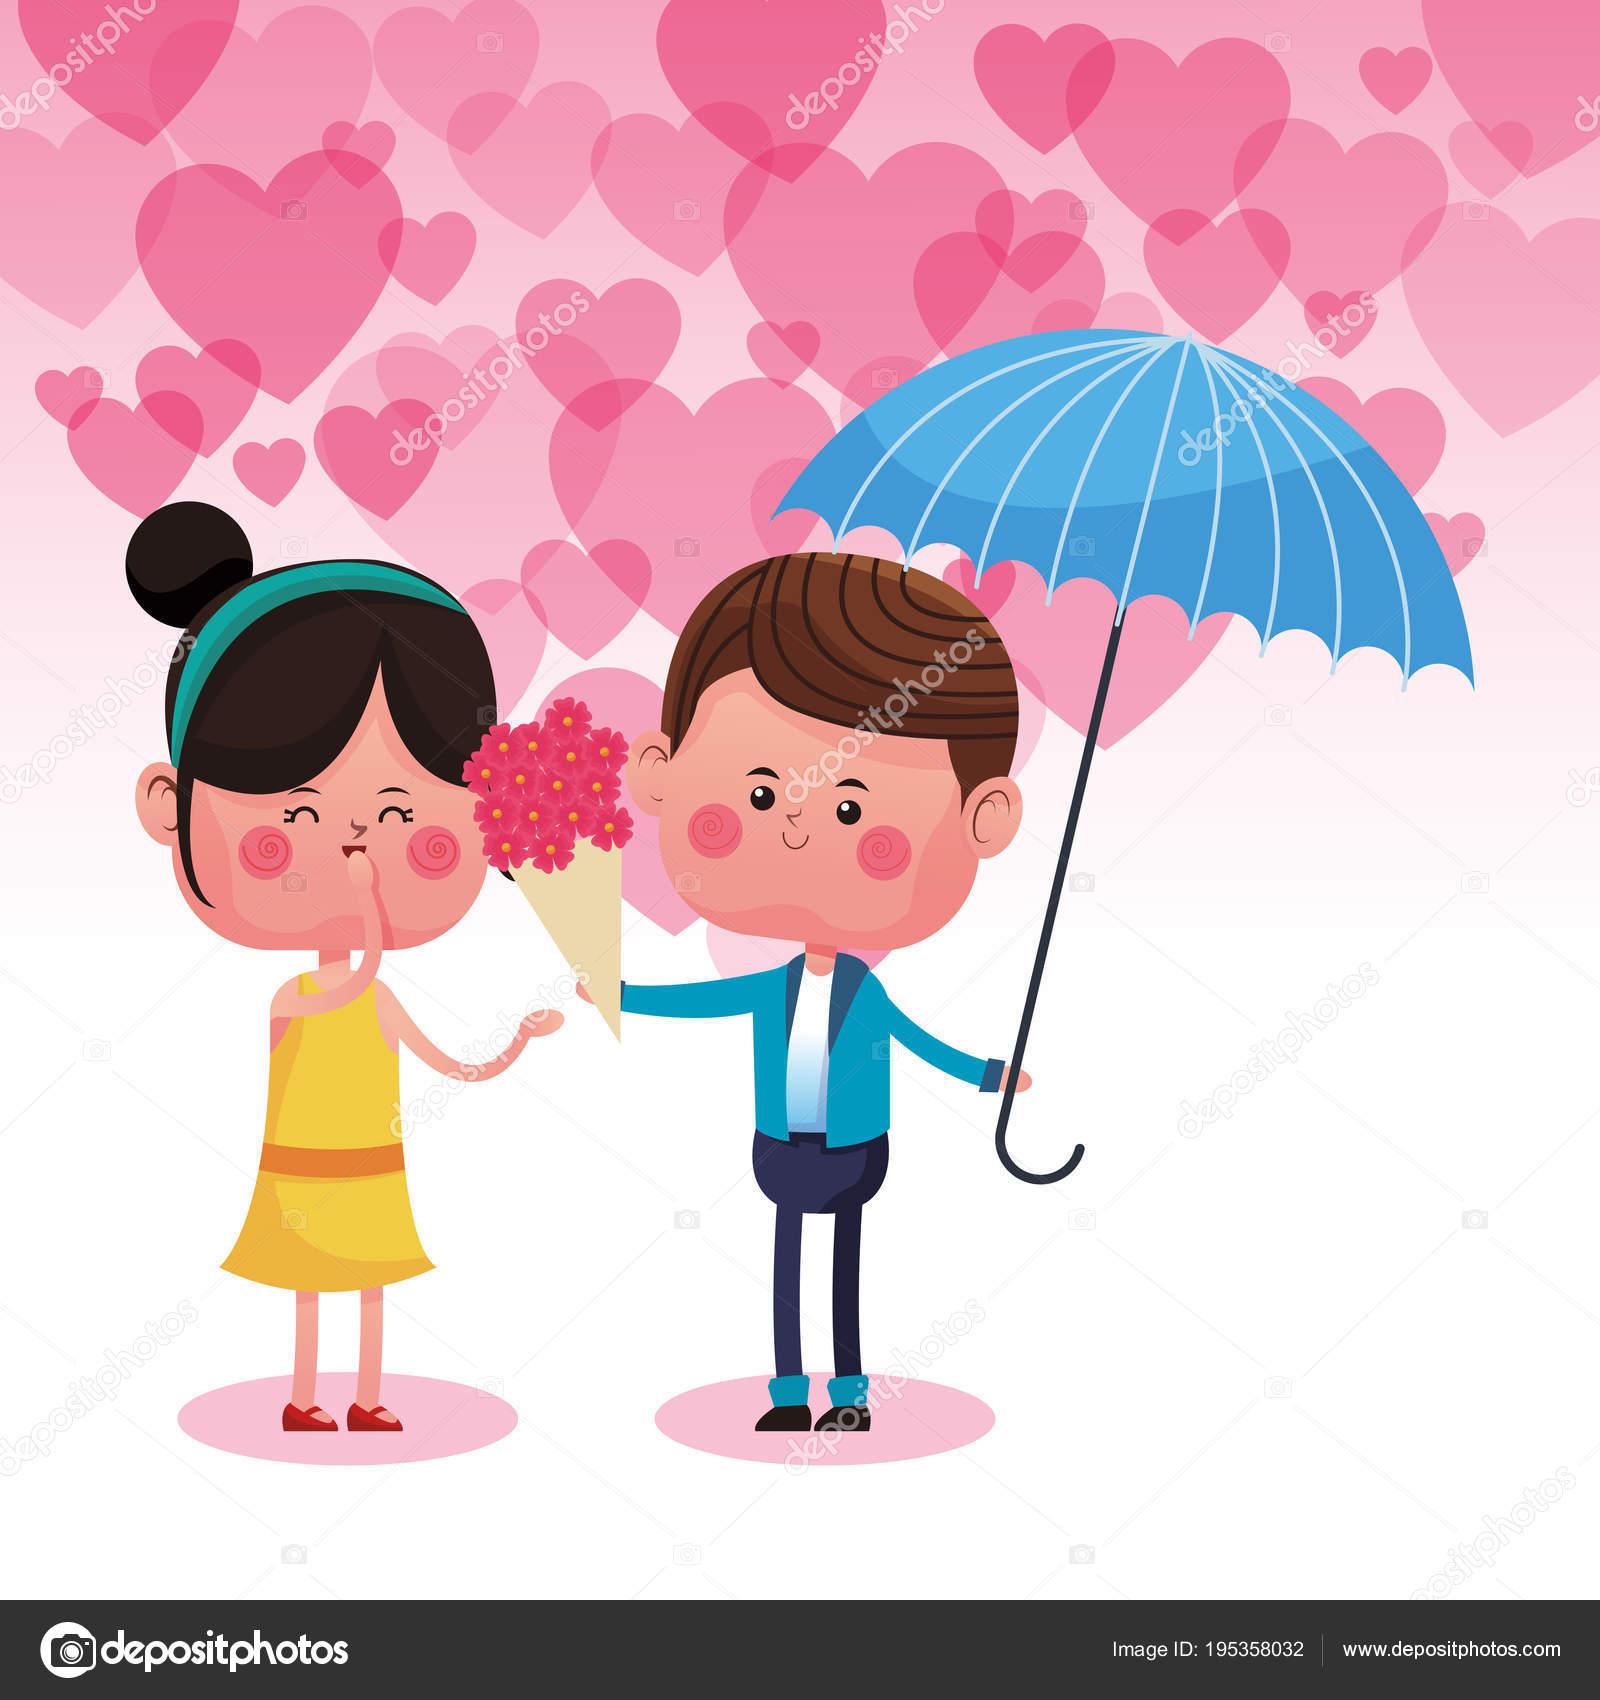 Cute Couple In Love Cartoons Stock Vector C Jemastock 195358032